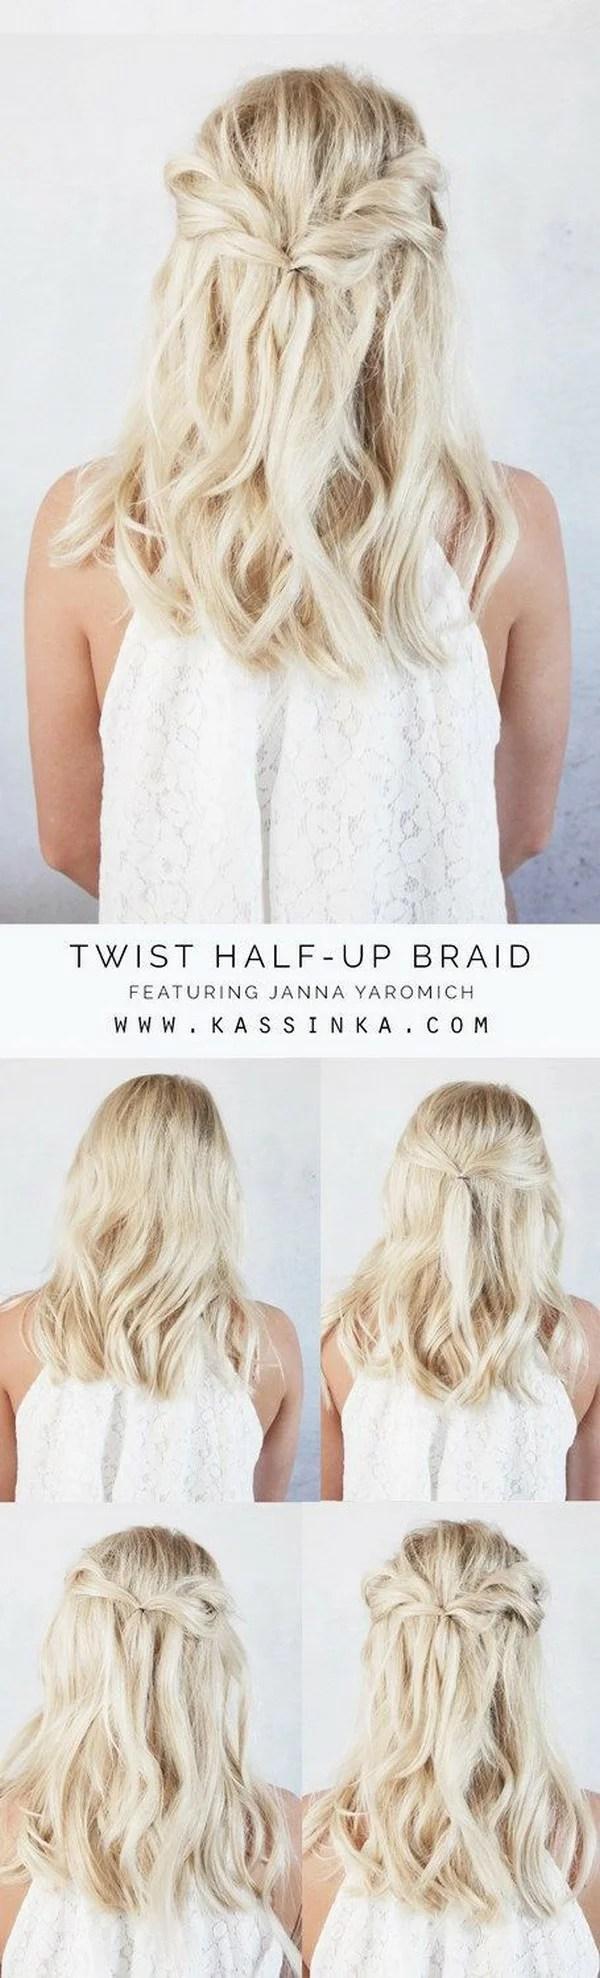 10 latest wedding hairstyles for medium length hair